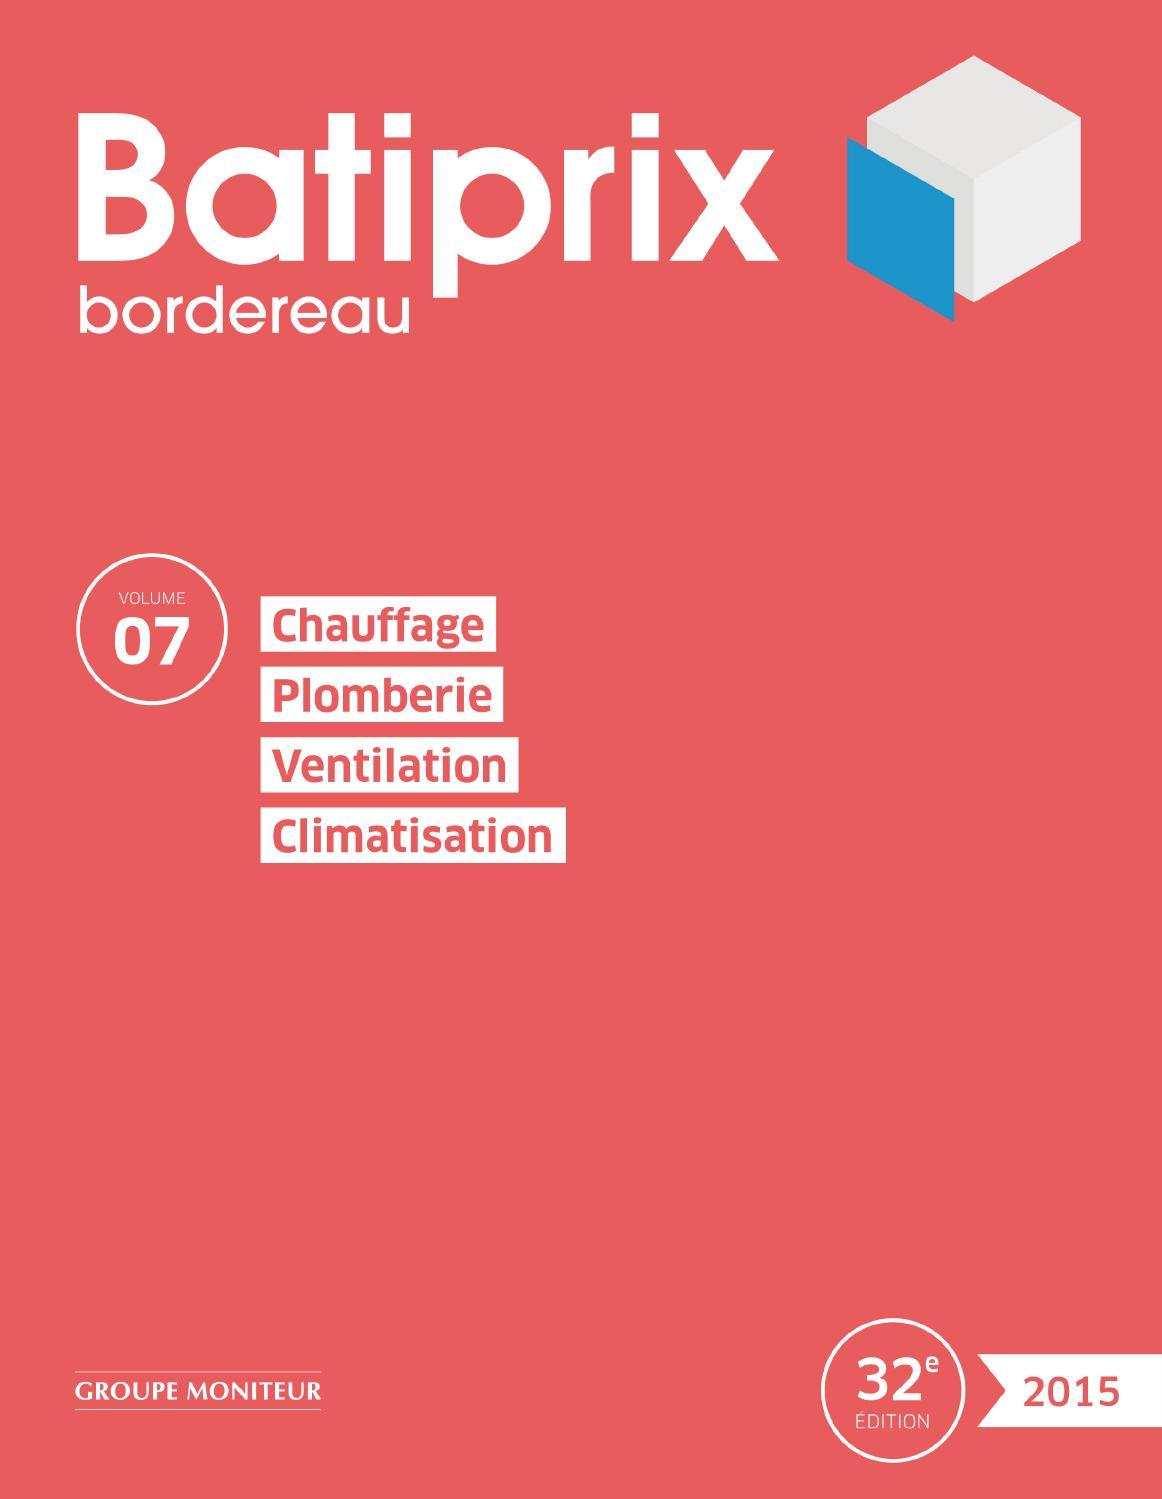 extrait batiprix 2015 volume 7 by infopro digital issuu. Black Bedroom Furniture Sets. Home Design Ideas